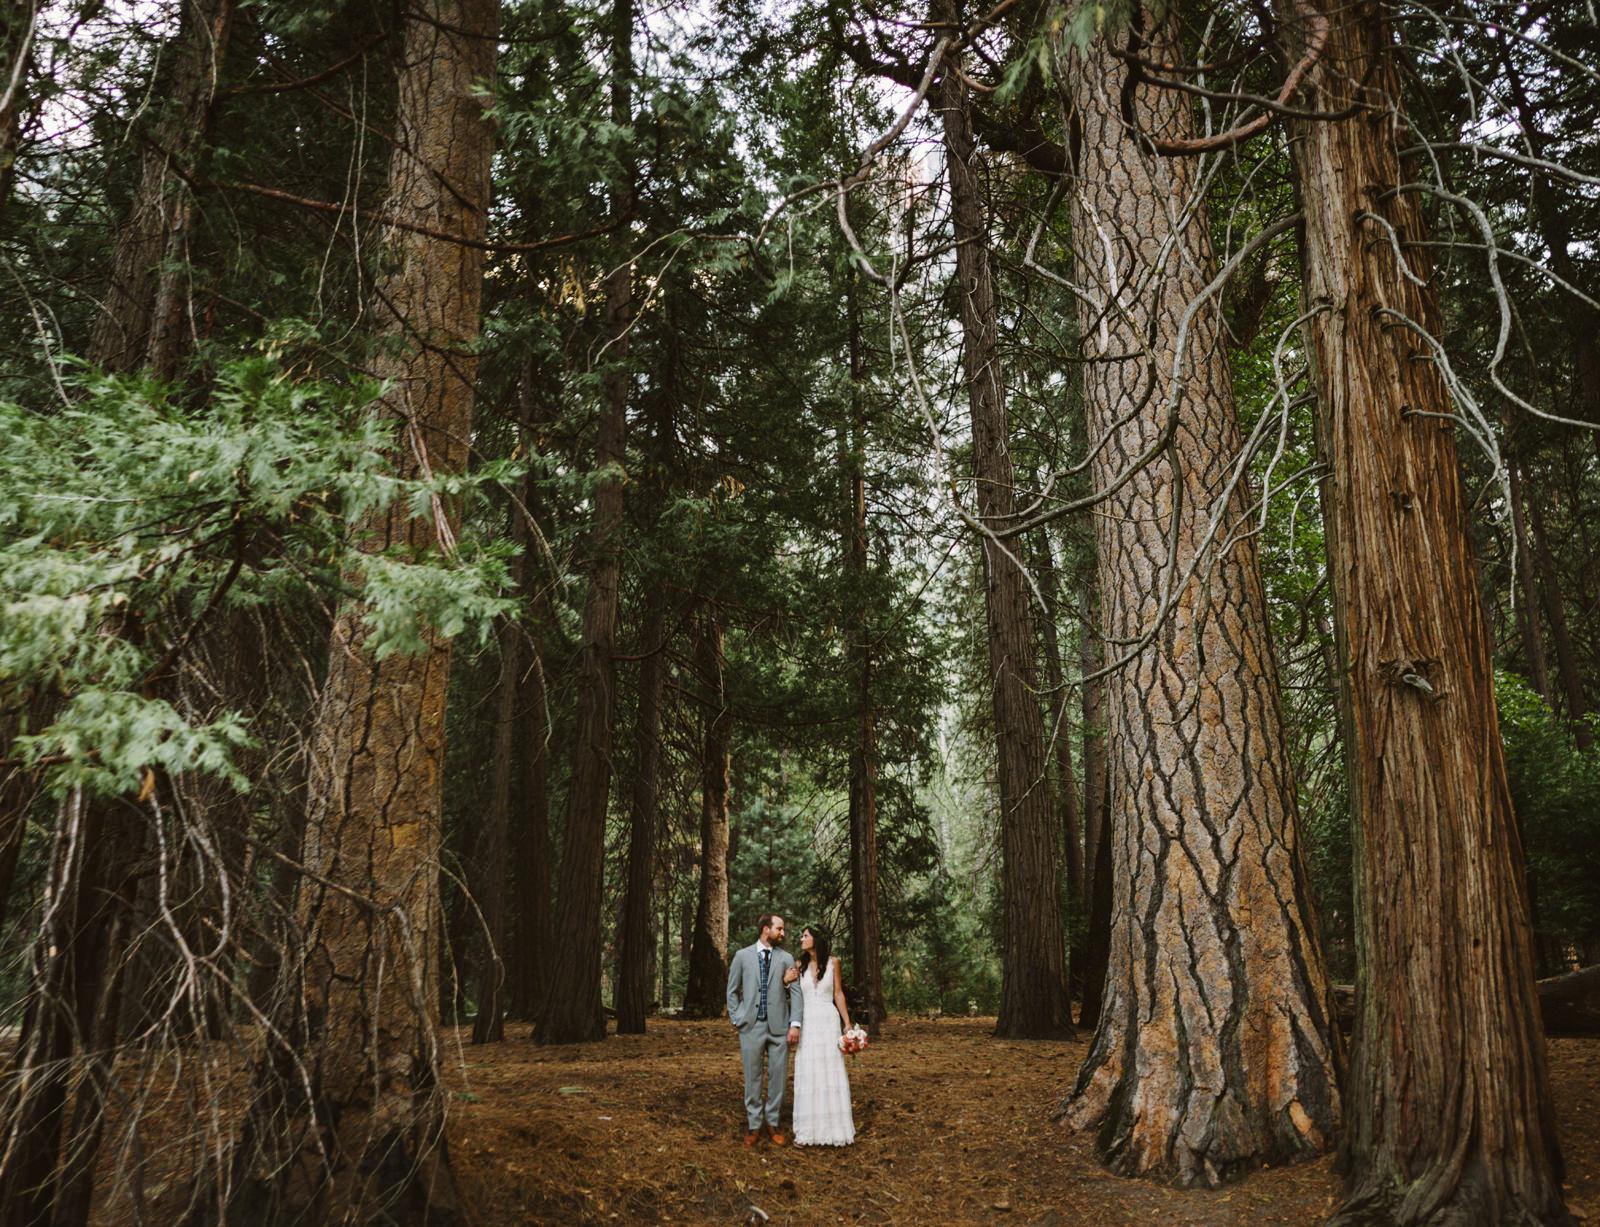 yosemite-intimate-wedding-102 YOSEMITE INTIMATE WEDDING